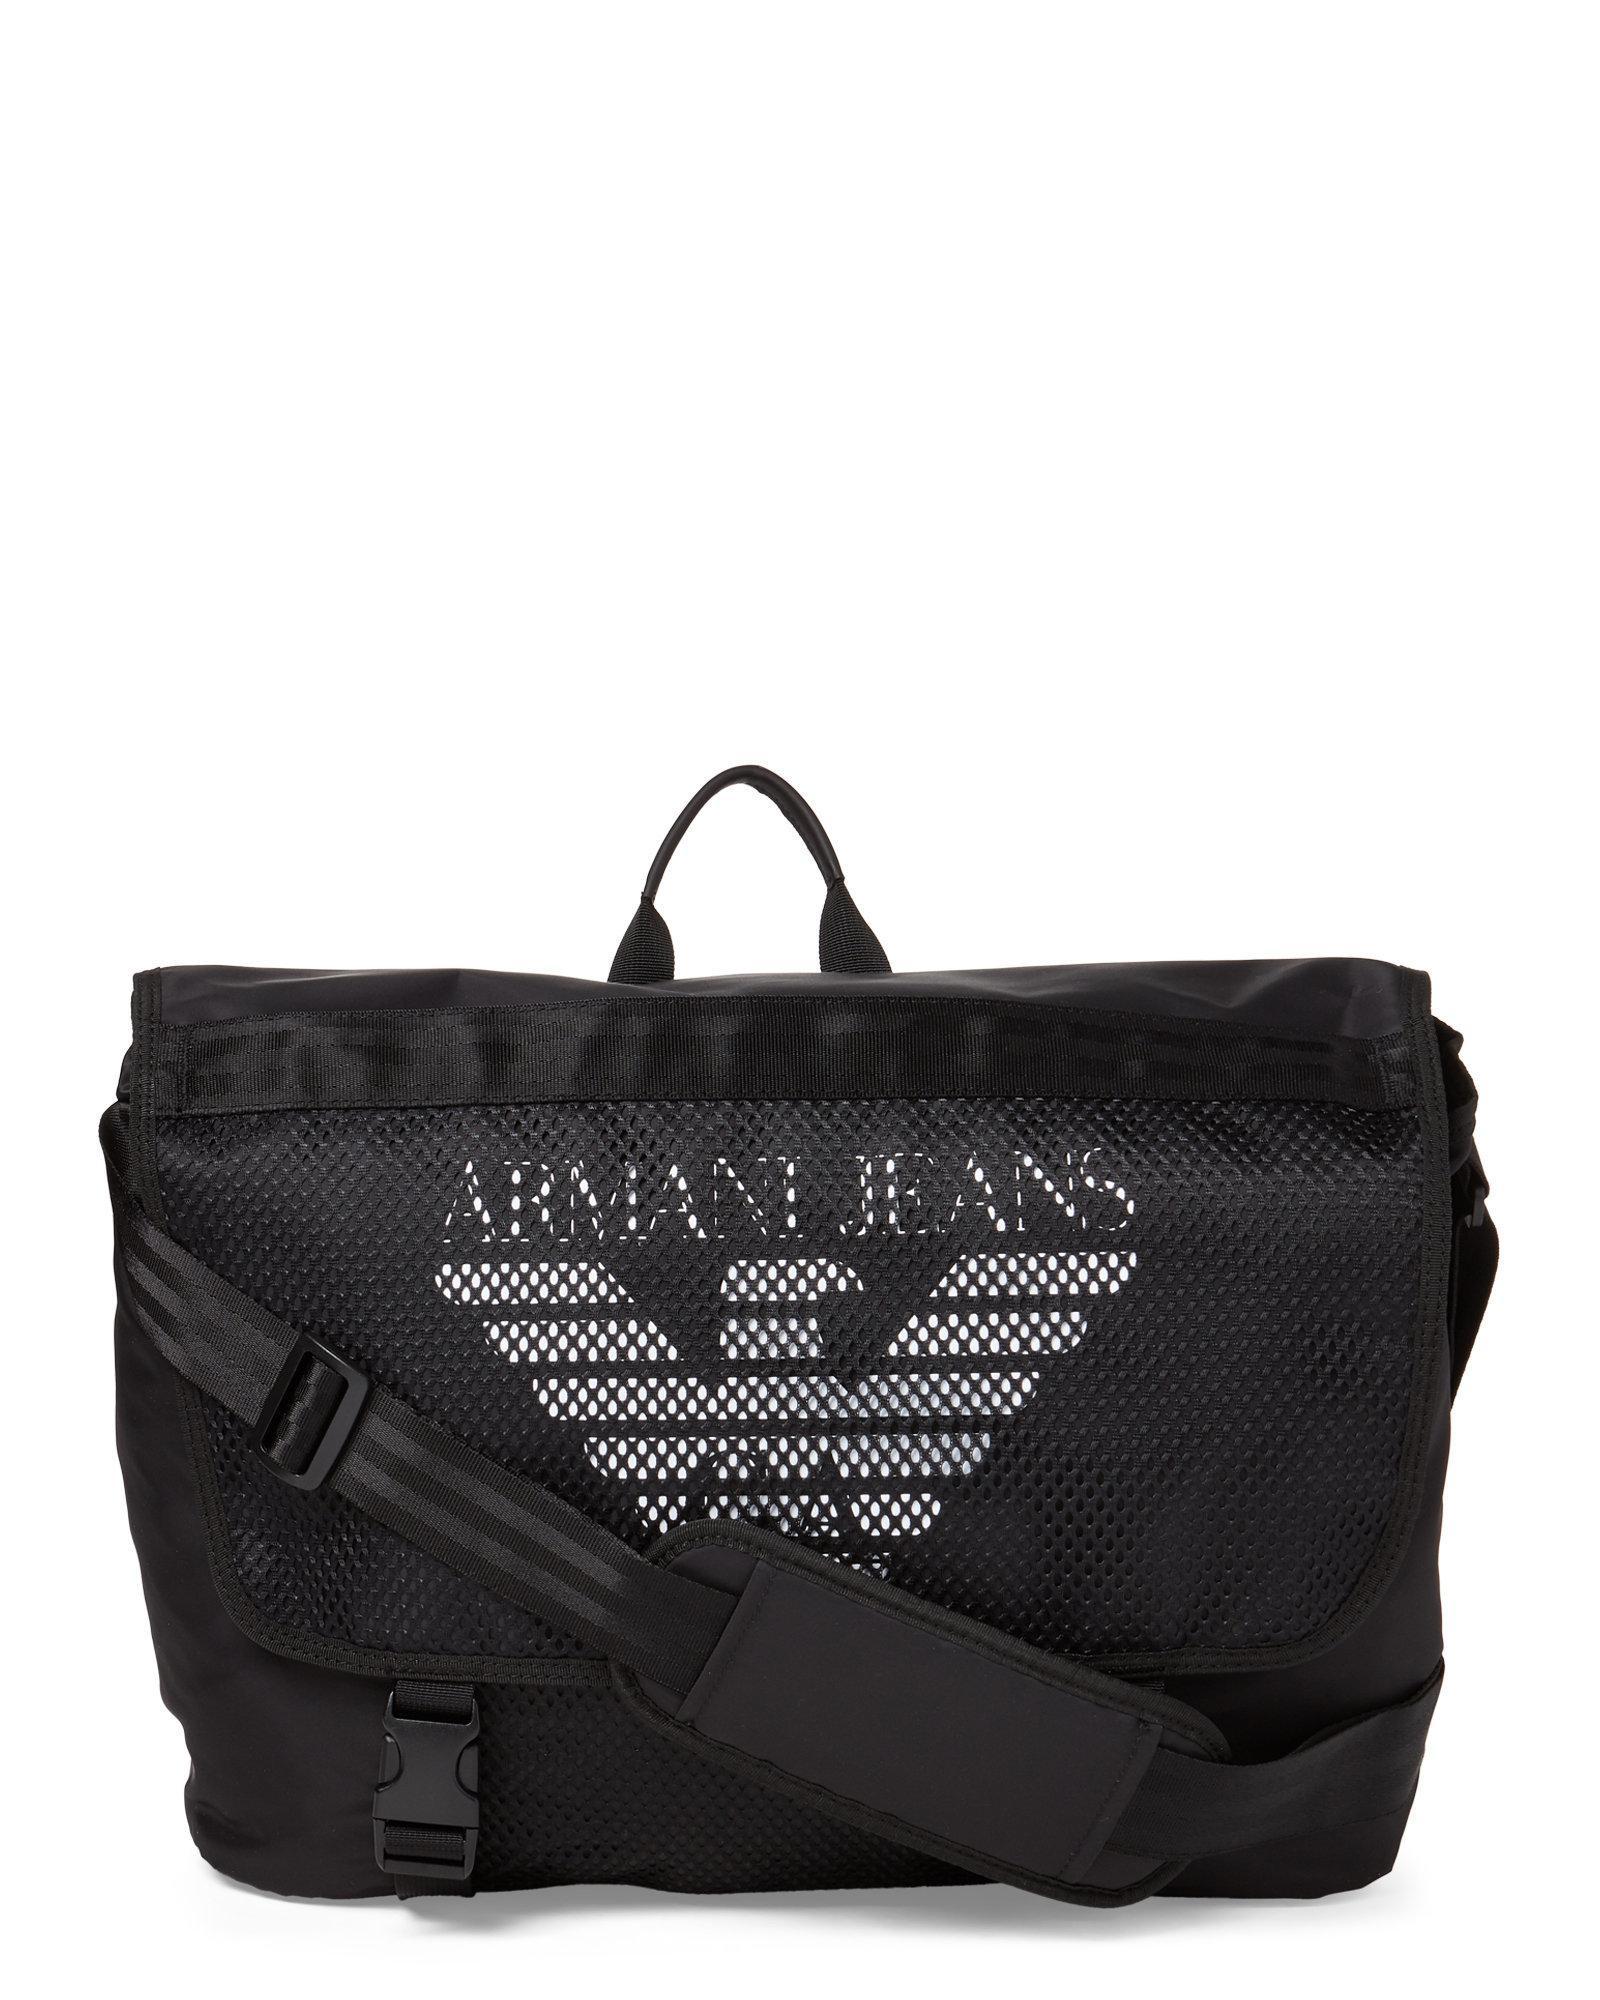 8a2f97fcda9 Armani Jeans - Black Logo Messenger Bag for Men - Lyst. View fullscreen